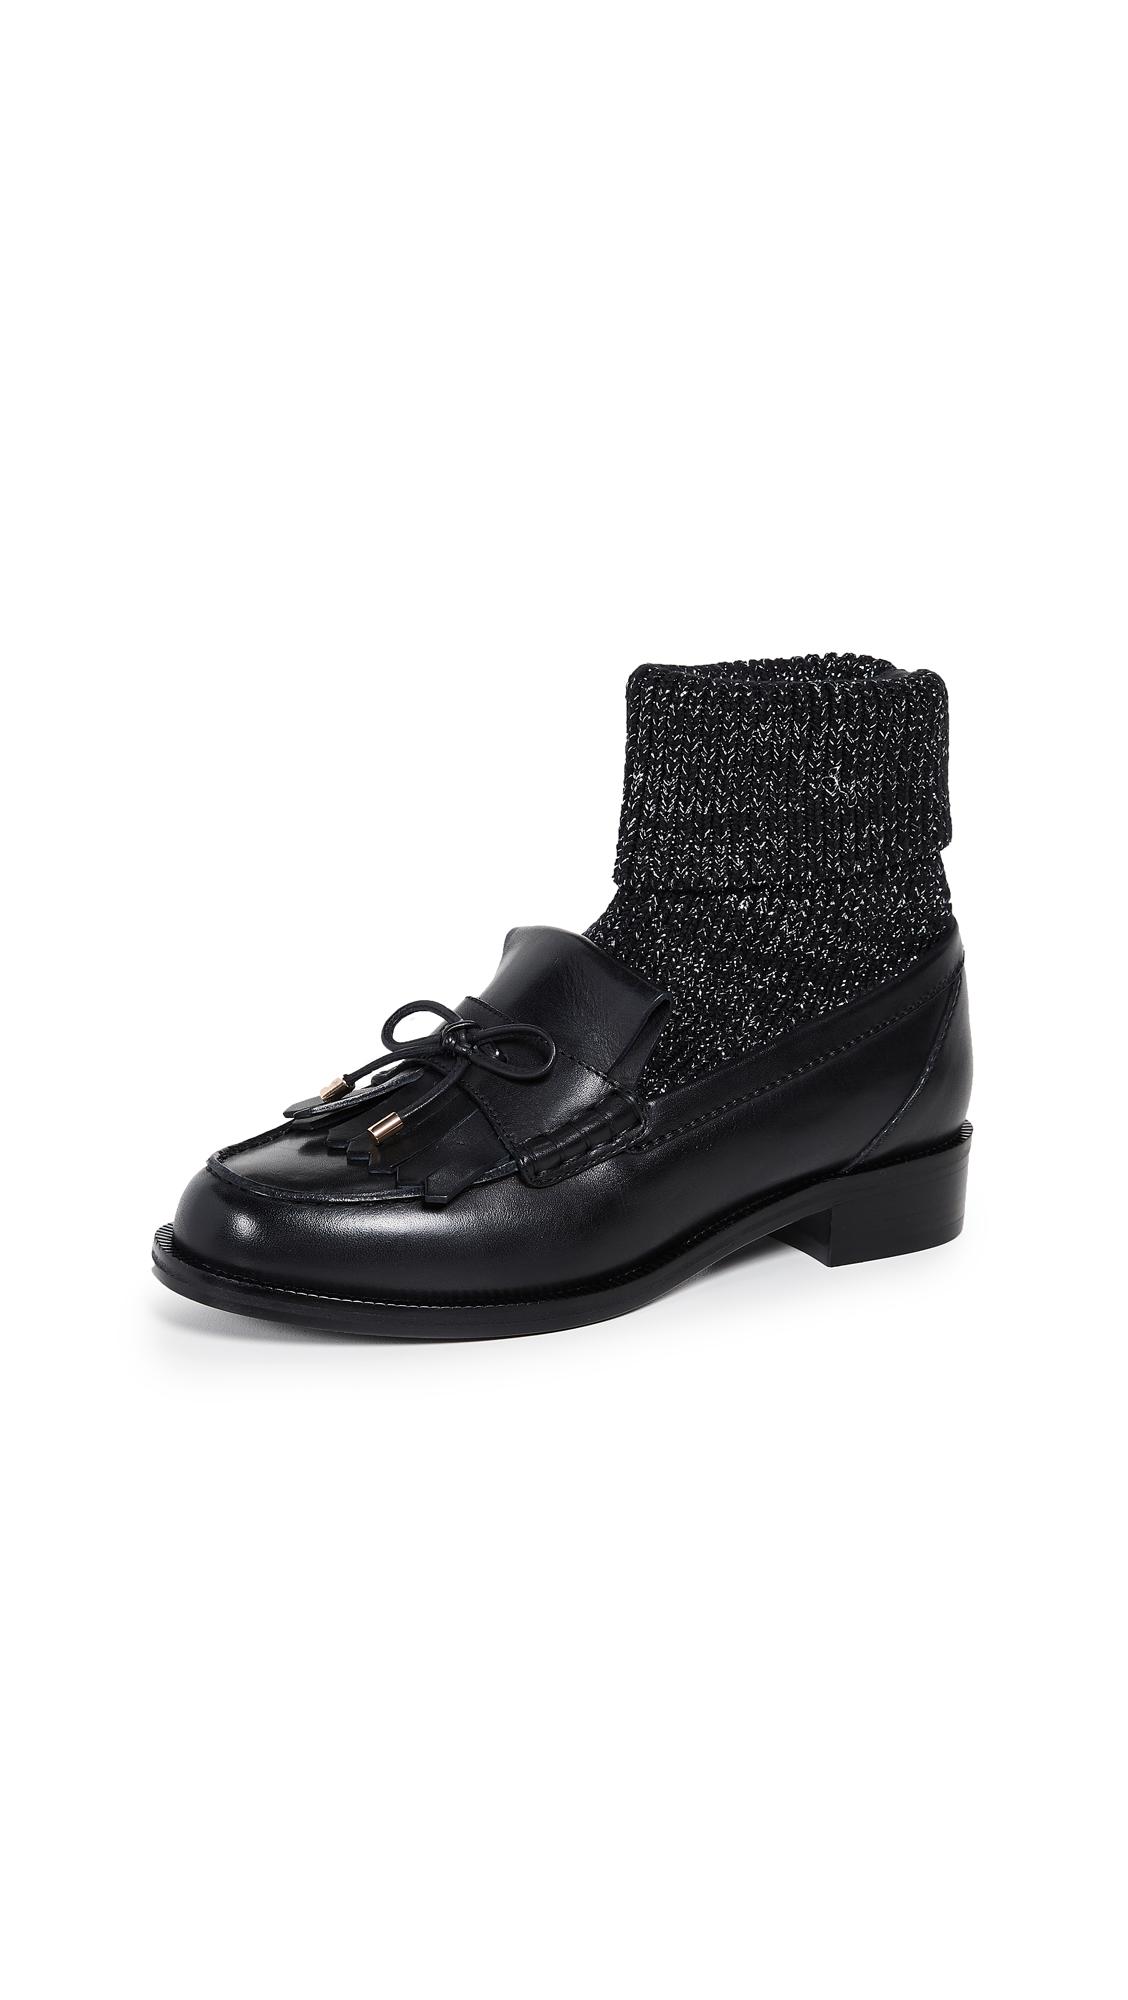 Stella Luna Sorority Moccasin with Sock - Black/Silver